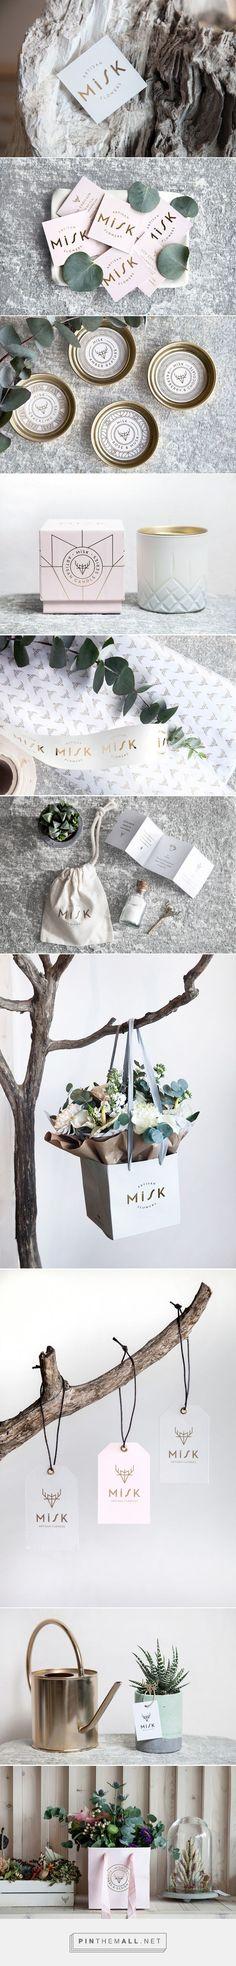 Misk Floral Cafe Branding by Ipek Eris | Fivestar Branding Agency – Design and Branding Agency & Curated Inspiration Gallery #branding #brand #packaging #floristbranding #design #designinspiration